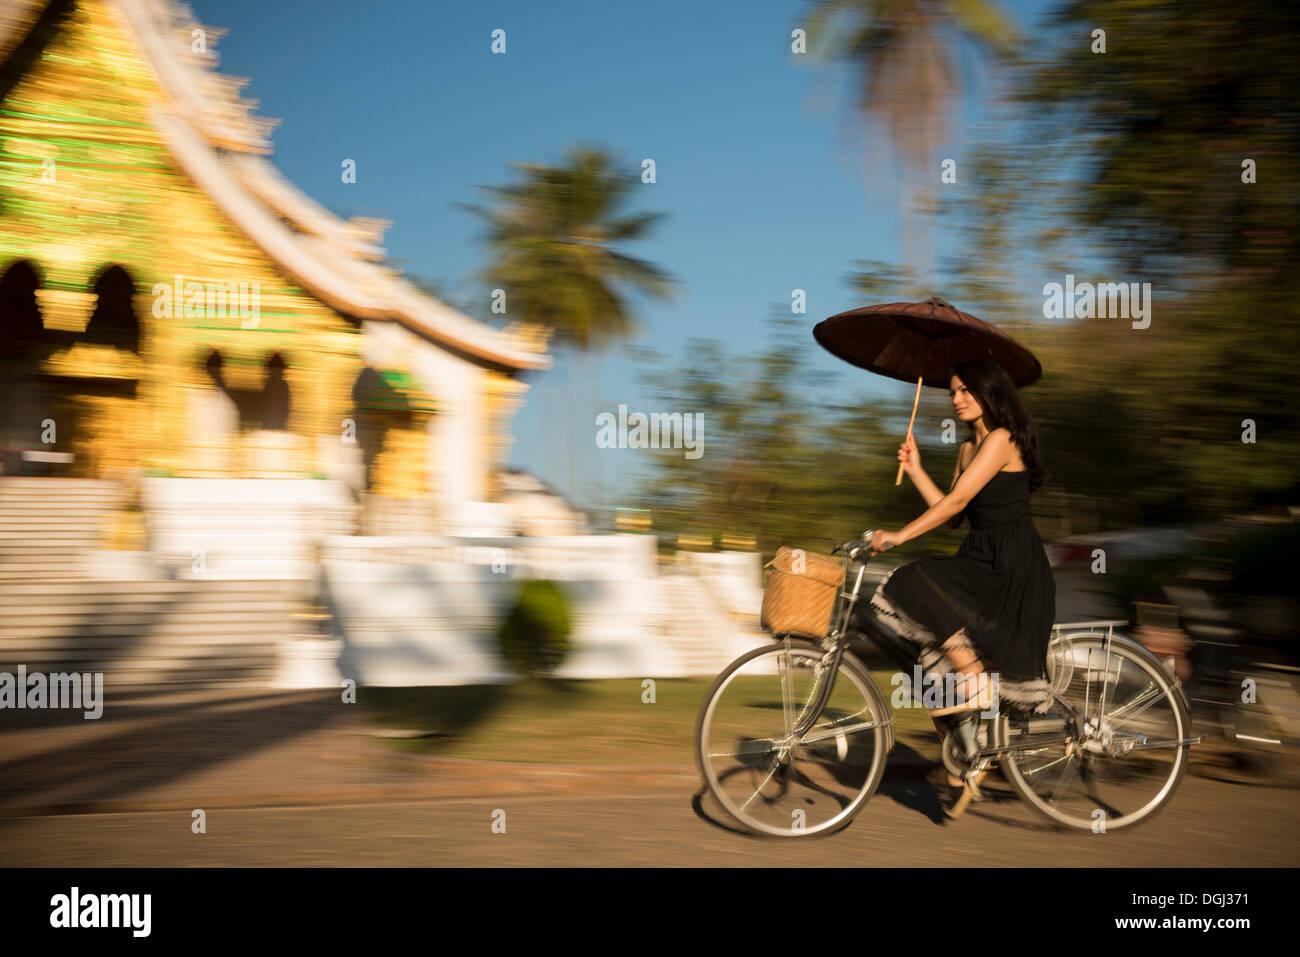 Woman riding bicycle with parasol, Luang Prabang, Laos - Stock Image